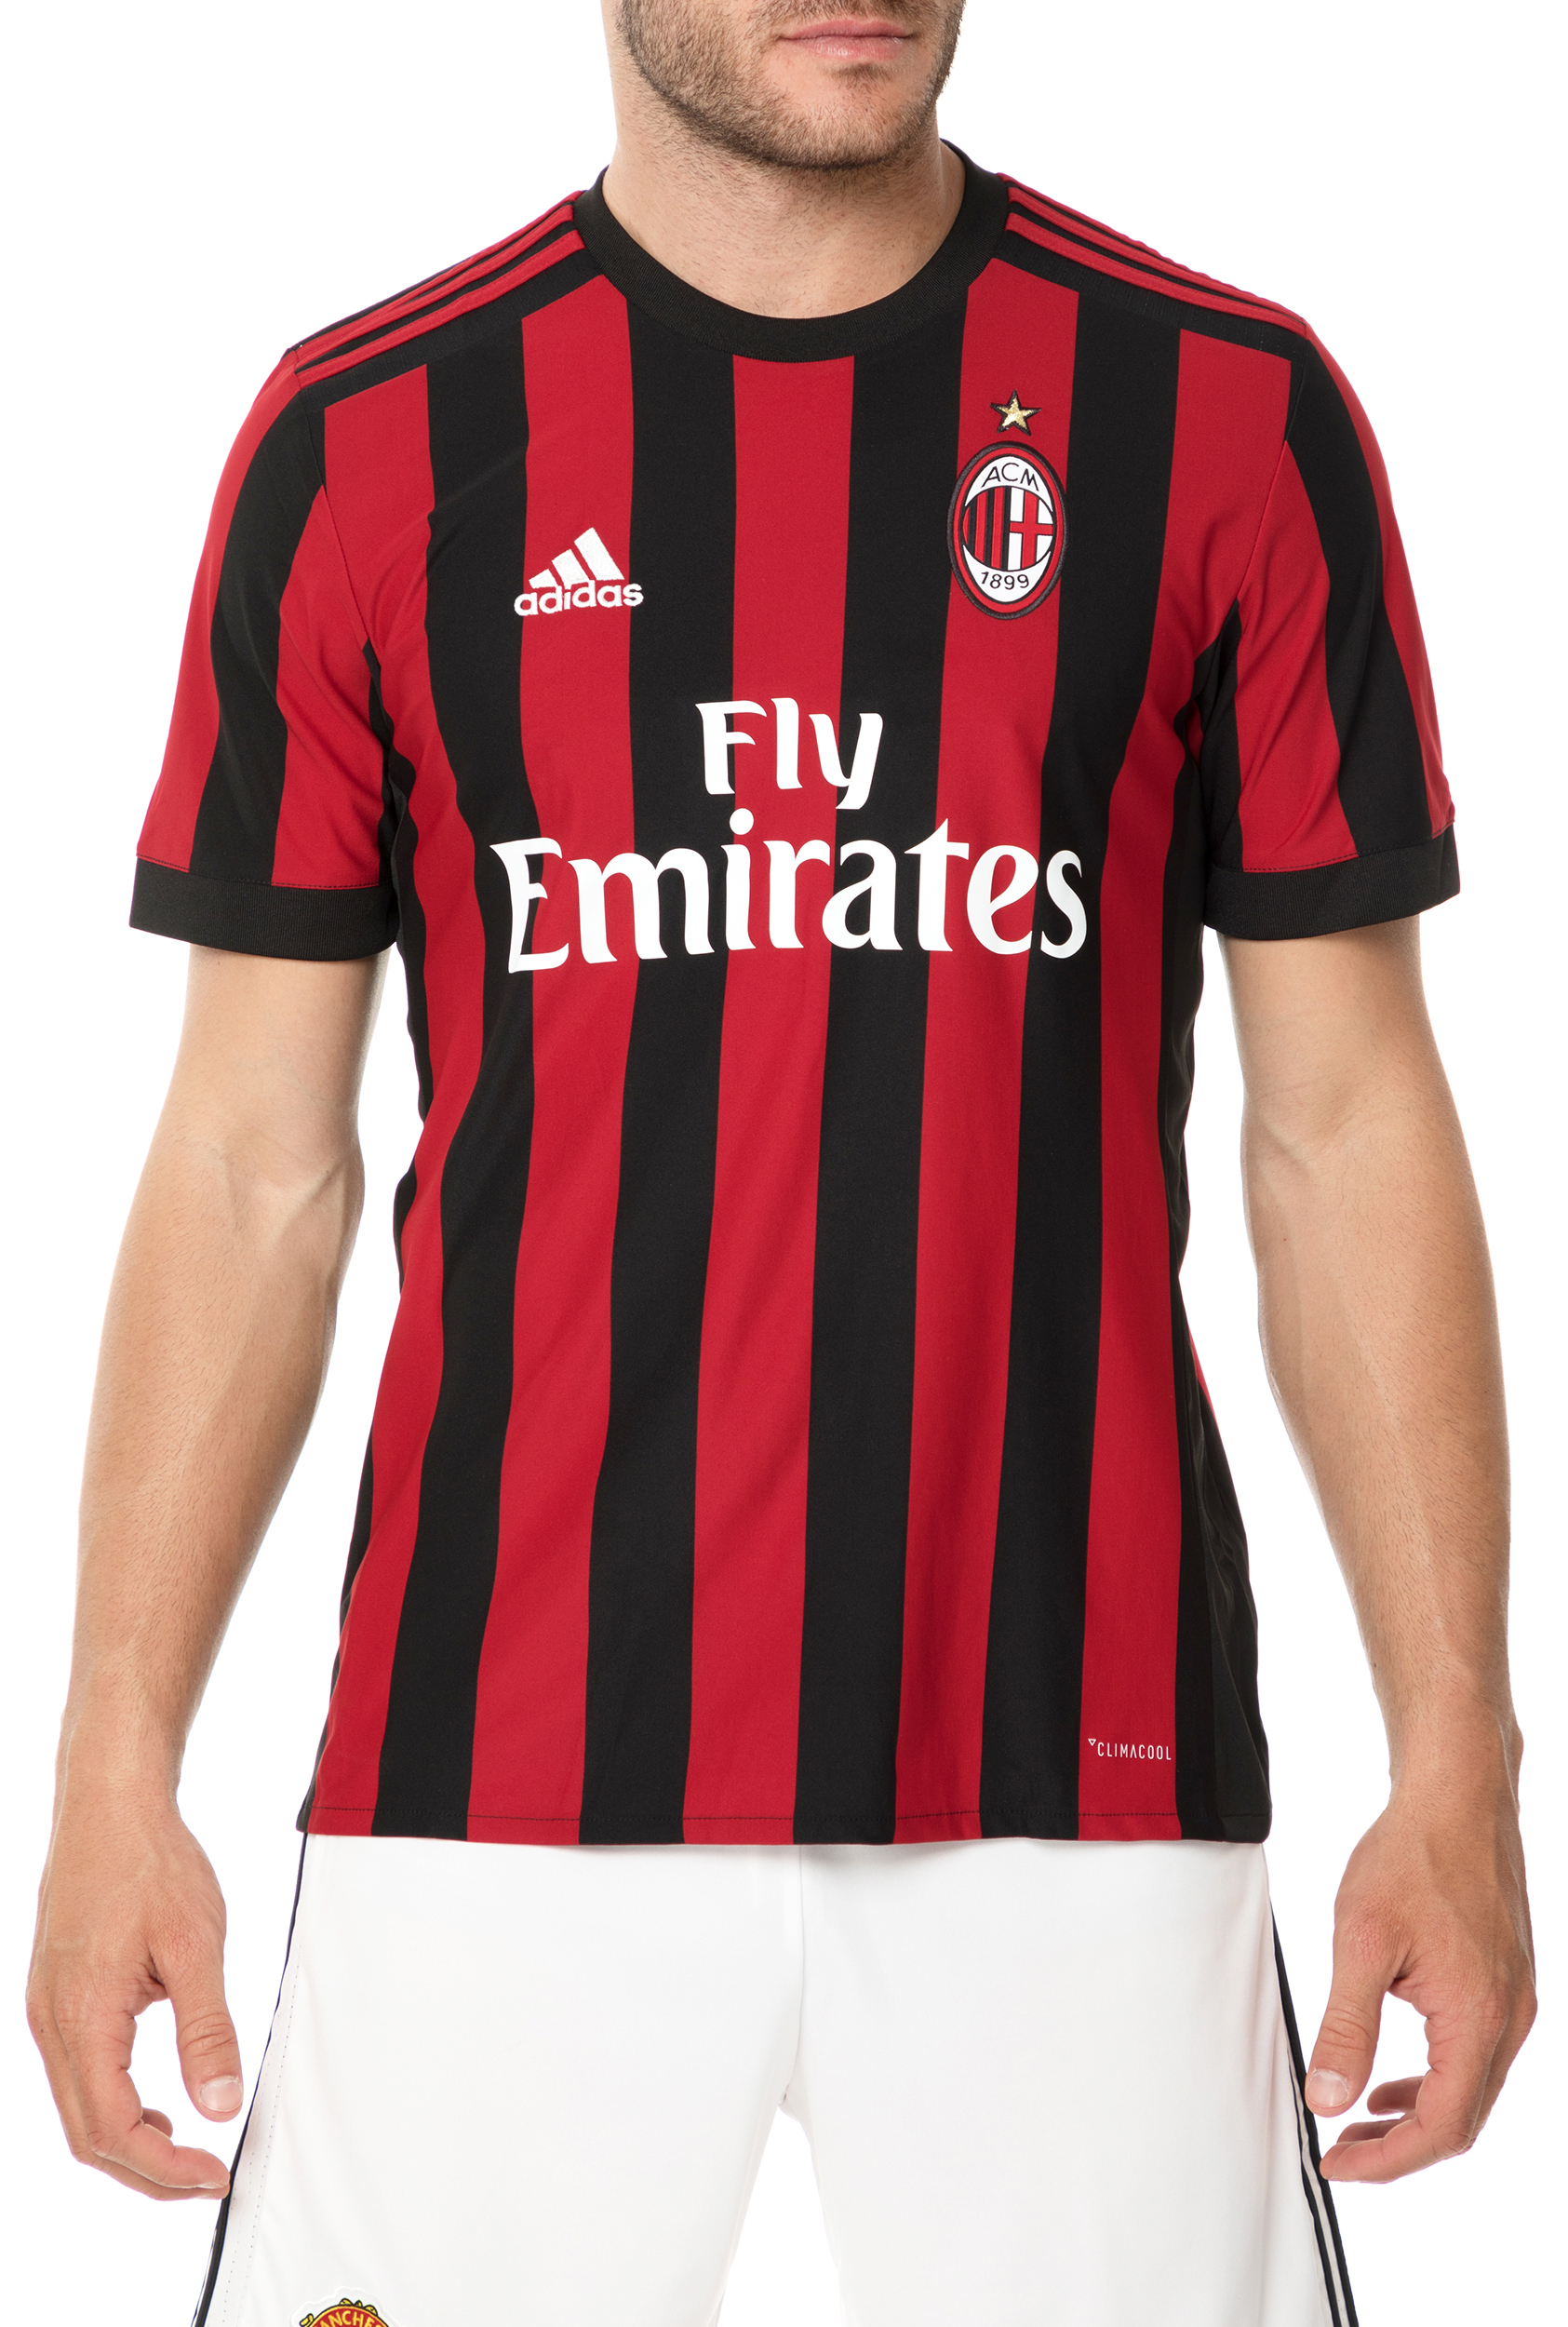 Sport-loft adidas Performance - Ανδρική φανέλα ποδοσφαίρου adidas AC Milan  Home Replica Jersey 6ad1f1dd006